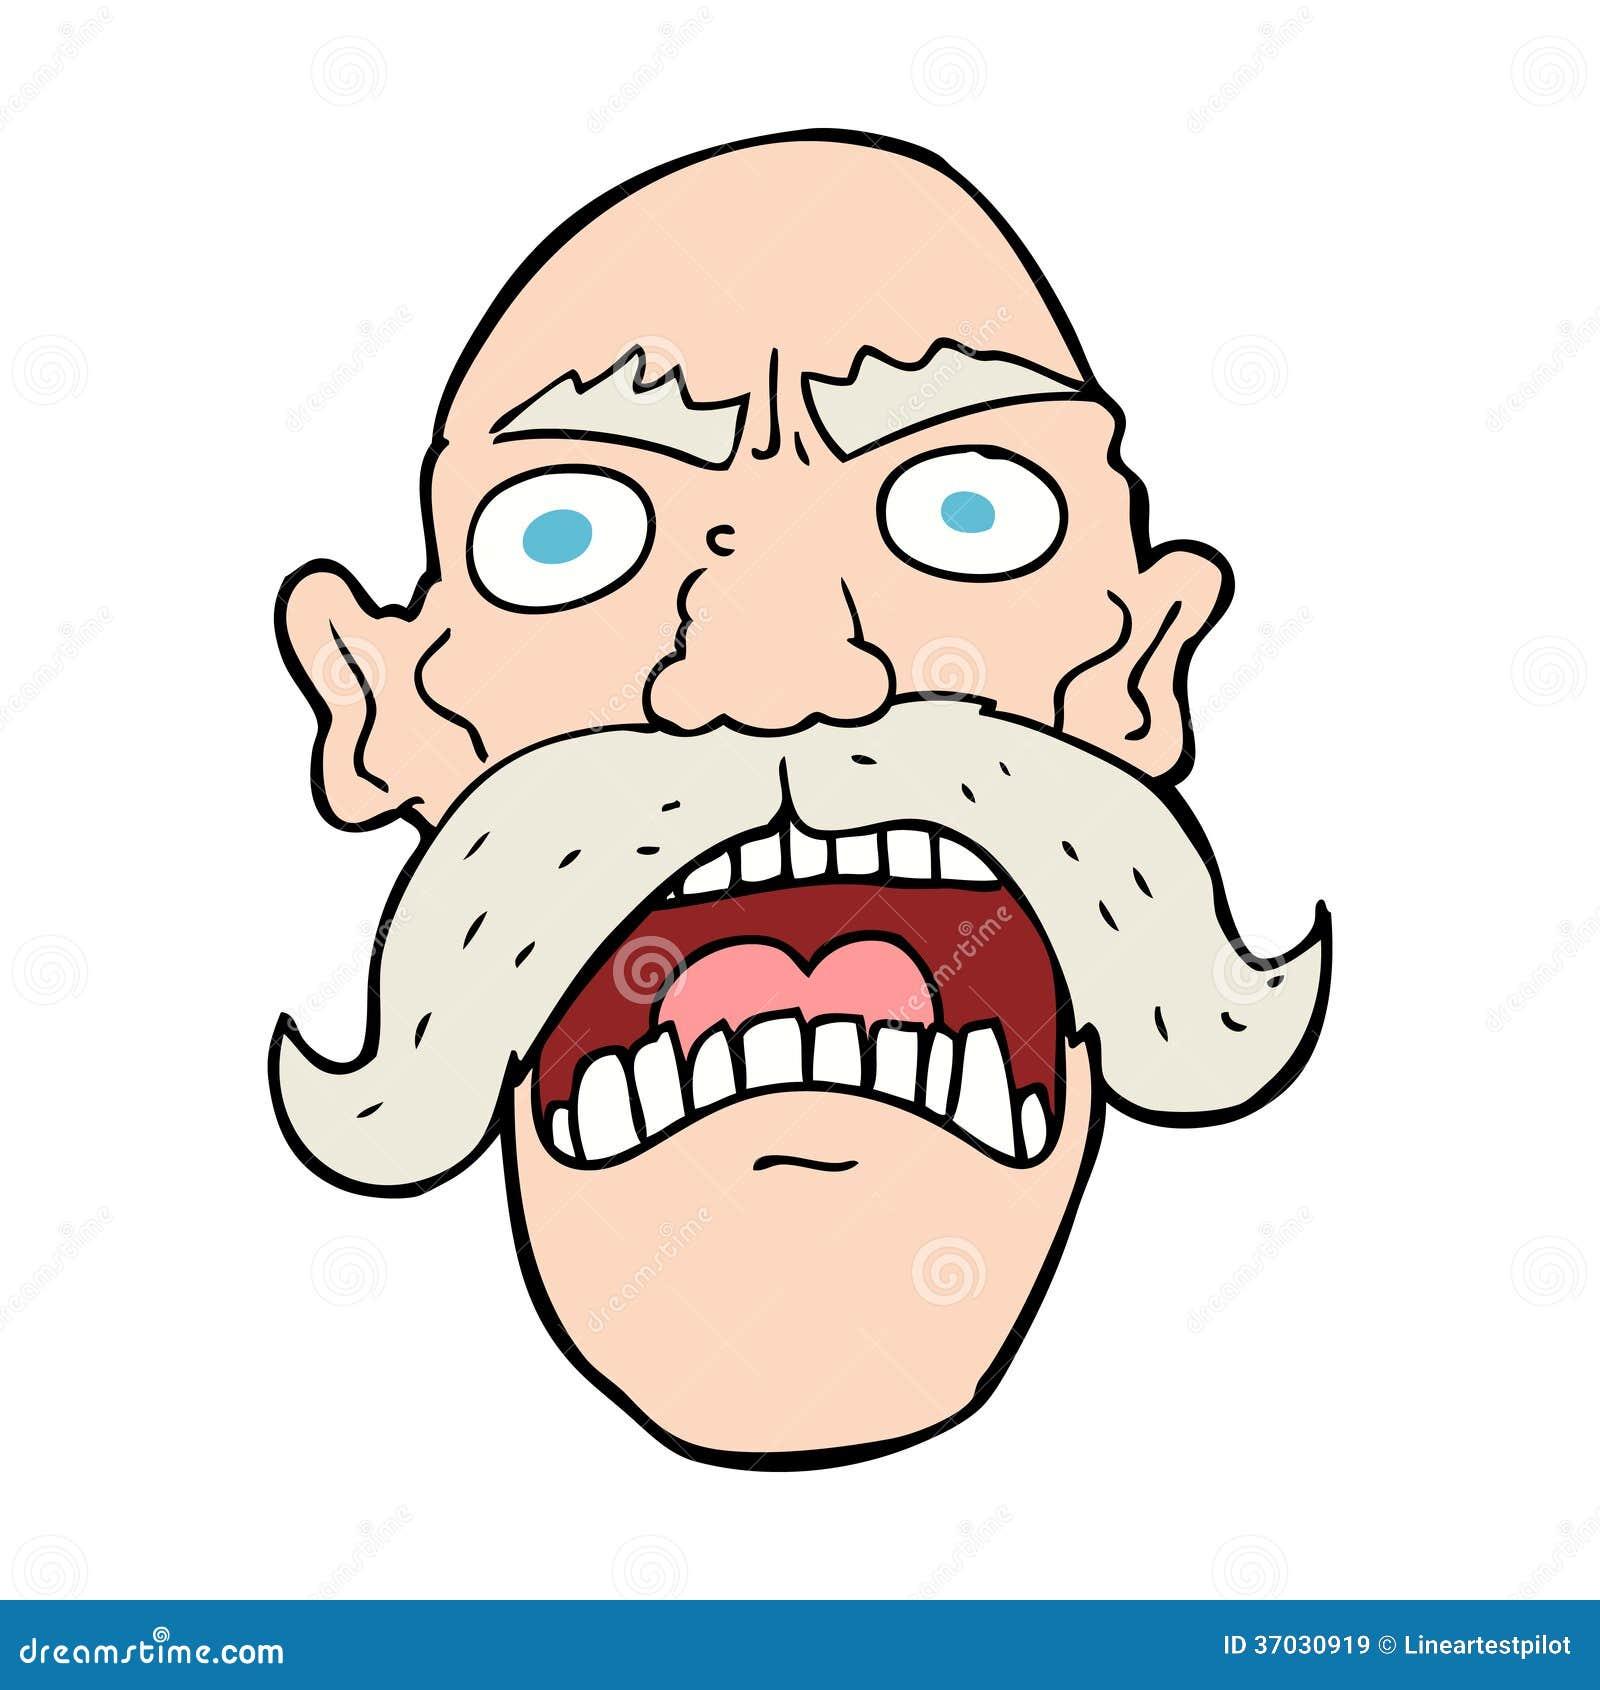 Old Man Cartoons Images Free Fandifavi Com